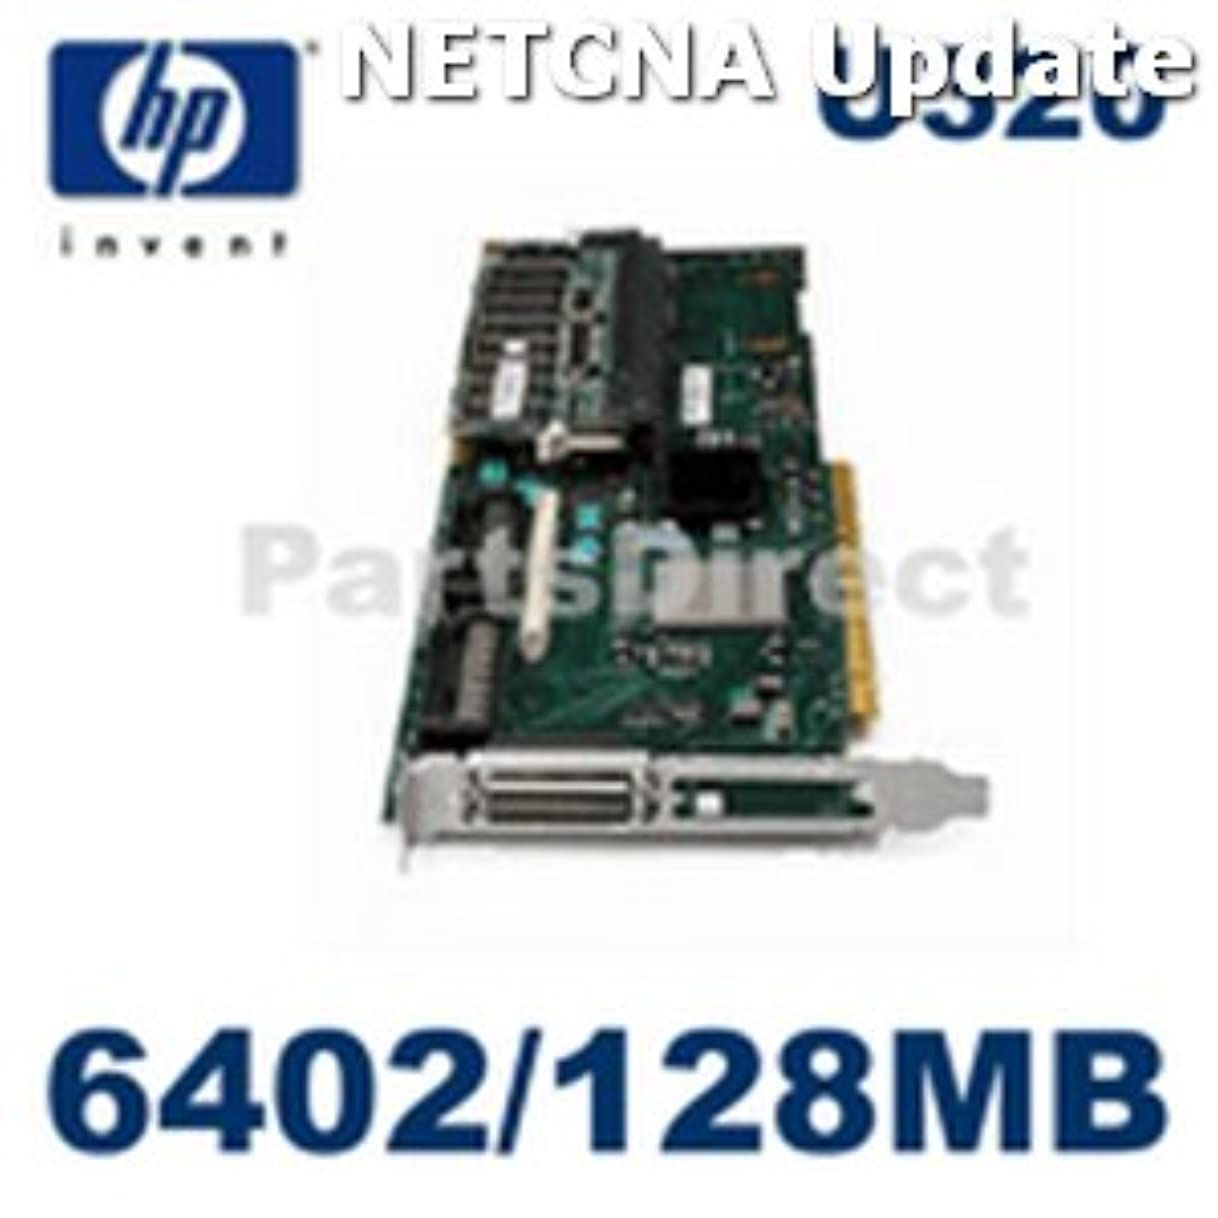 矢印革新前者309520 – 001 HP Smartアレイ6402 128 MB互換製品by NETCNA